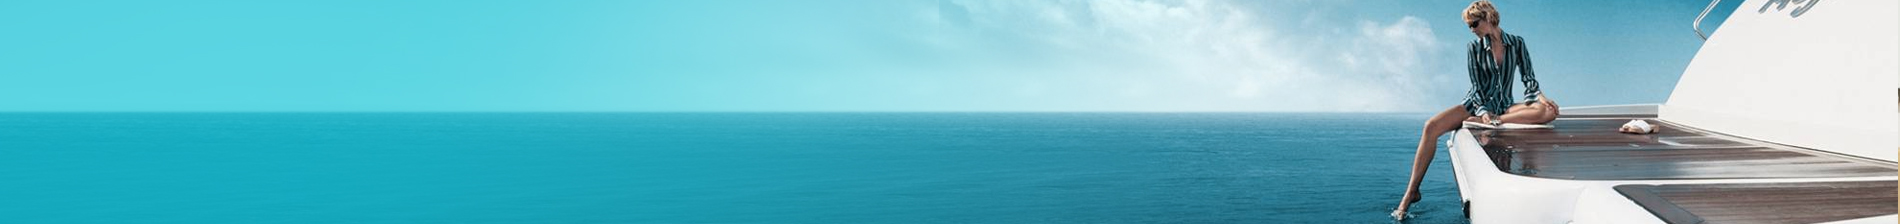 ibiza luxury holiday :: ibiza luxury yachts :: ibiza luxury charter :: yacht rental ibiza